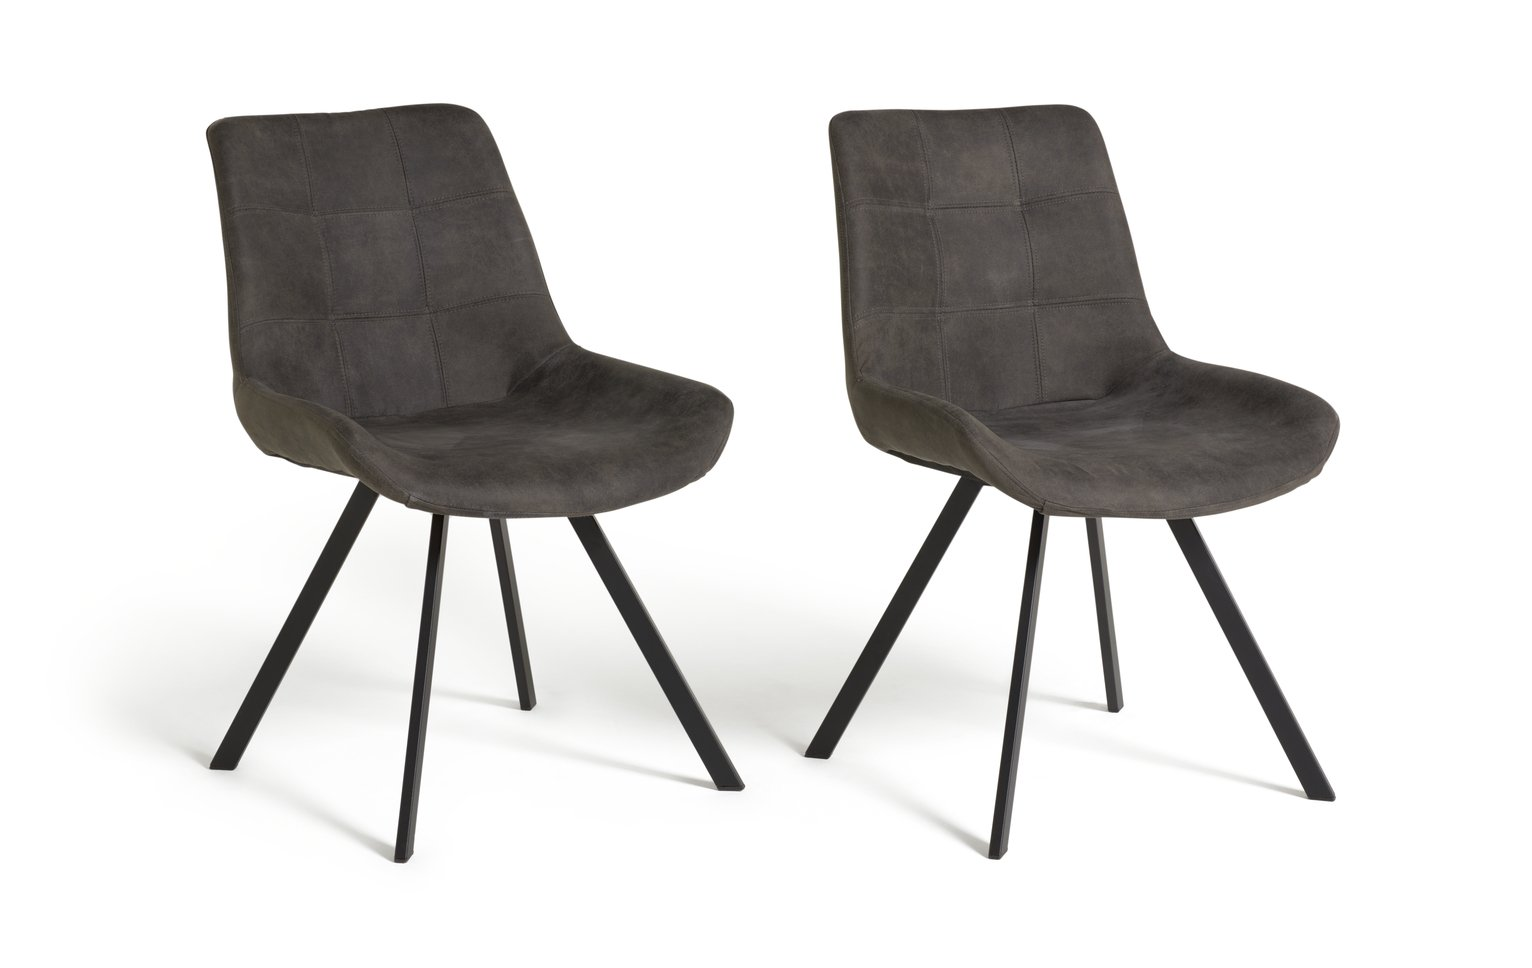 Argos Home Tribeca Pair of Microfibre Dining Chairs - Black